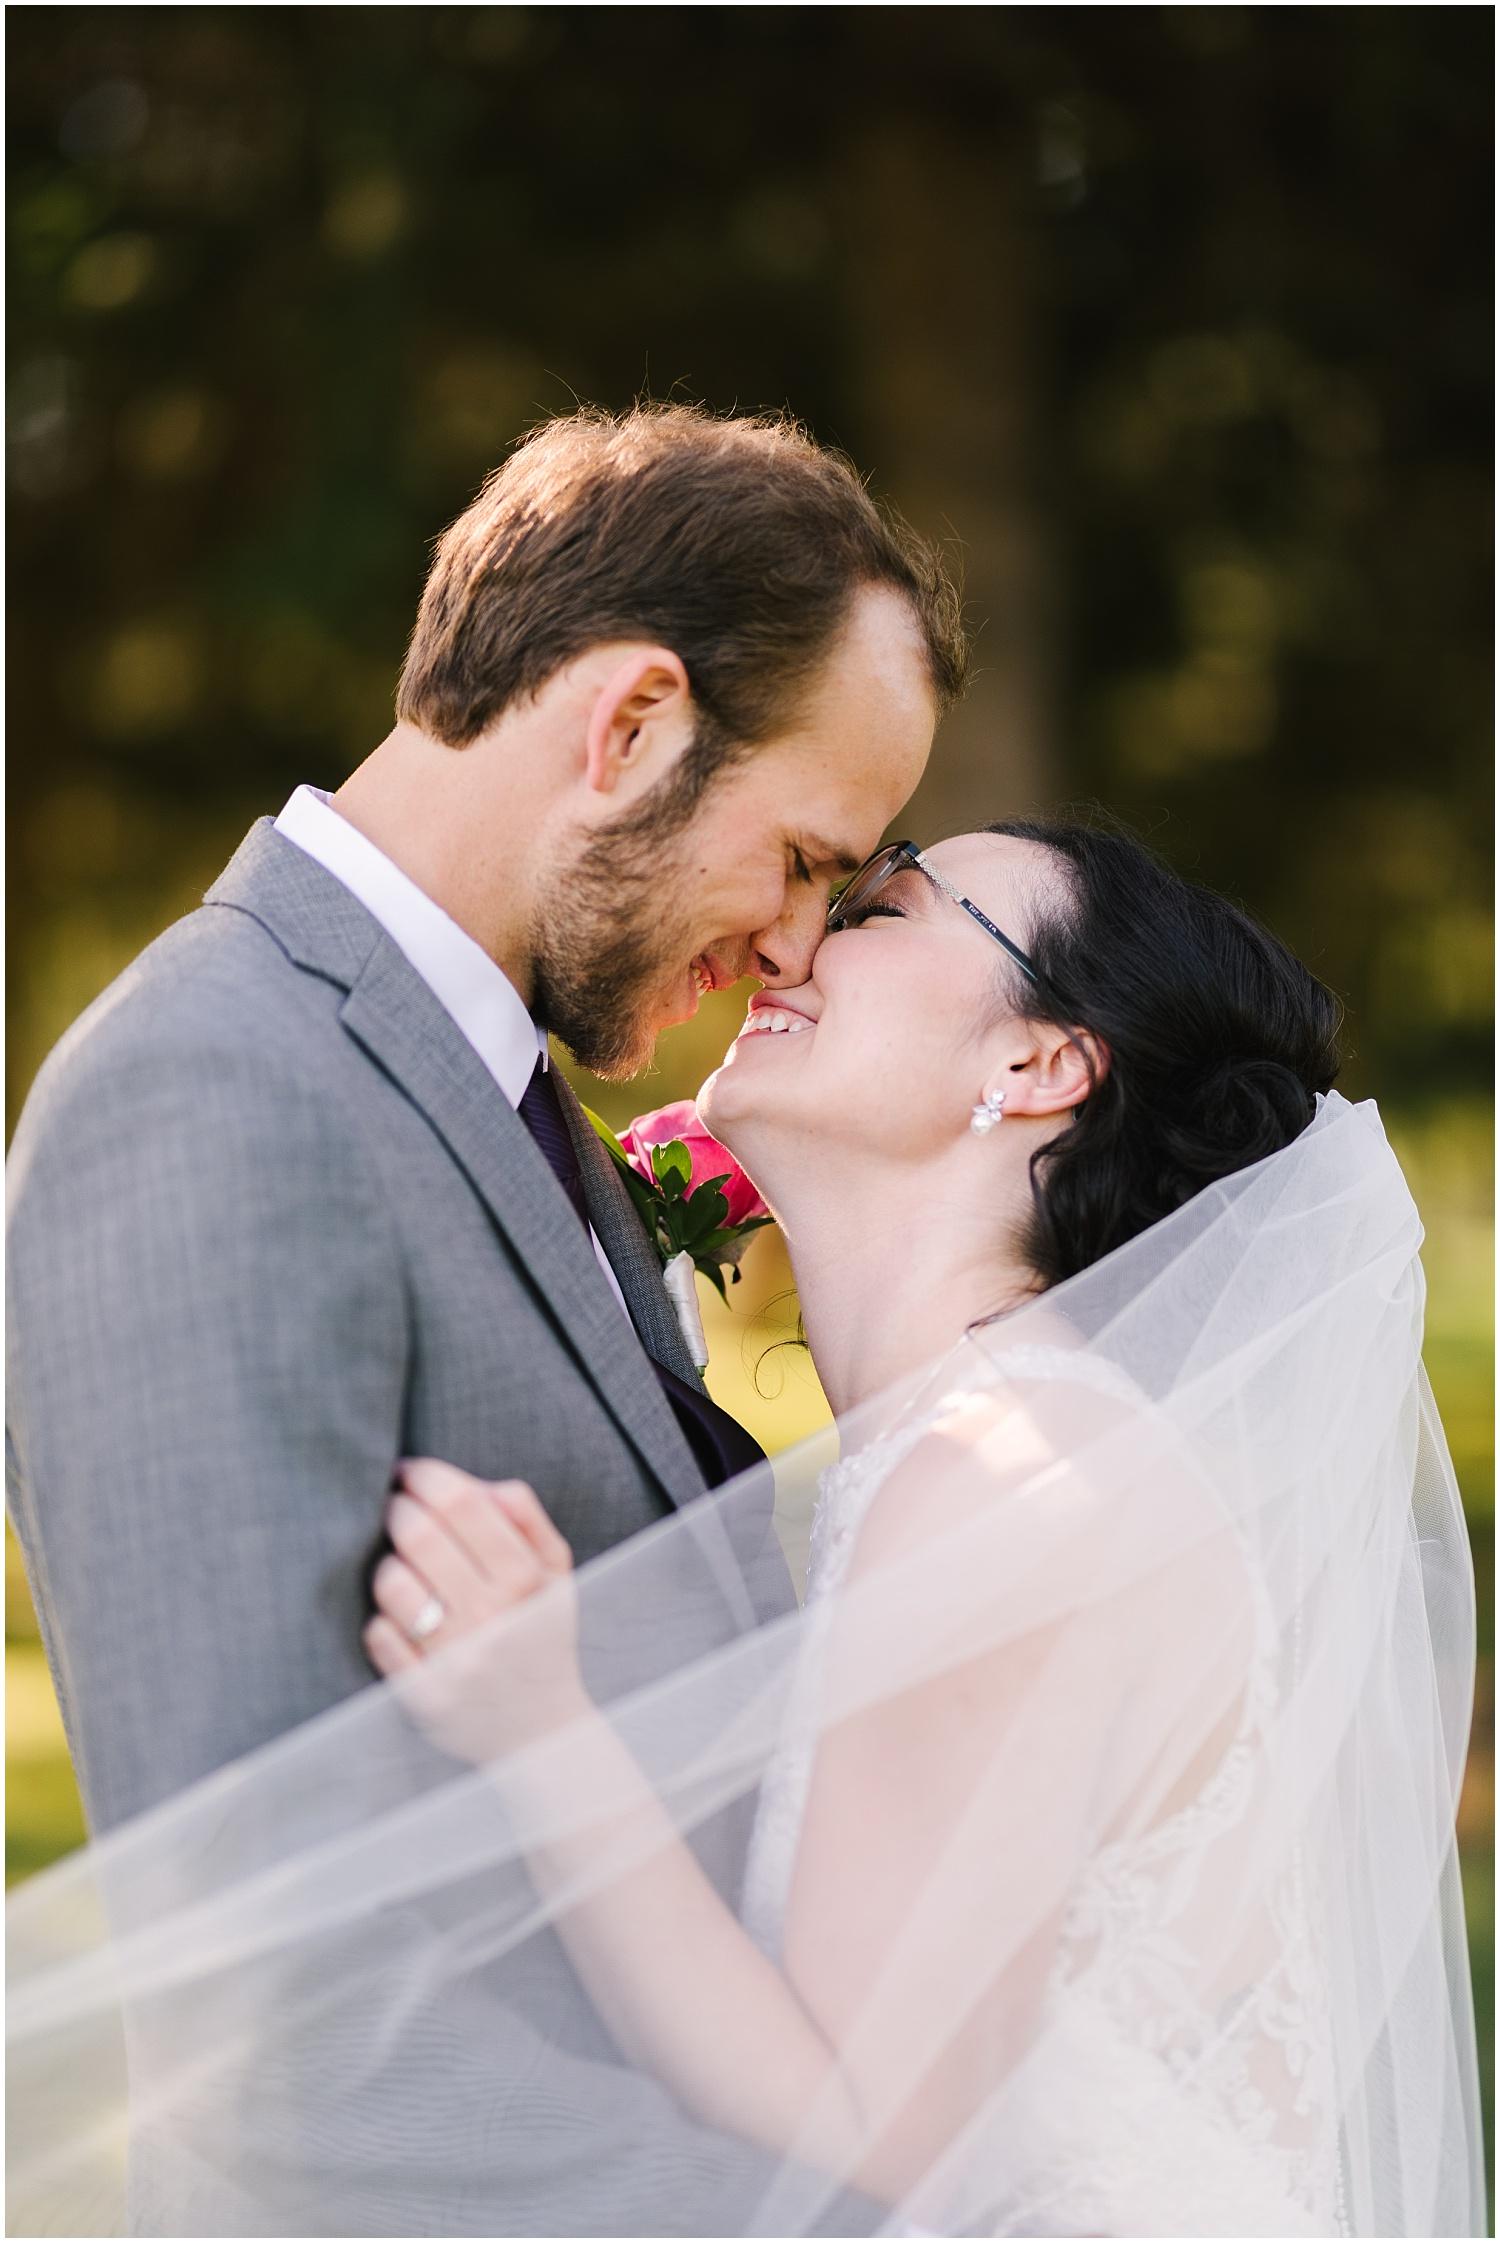 deerfield+country+club+wedding+rochester+NY+photographer (61).jpg